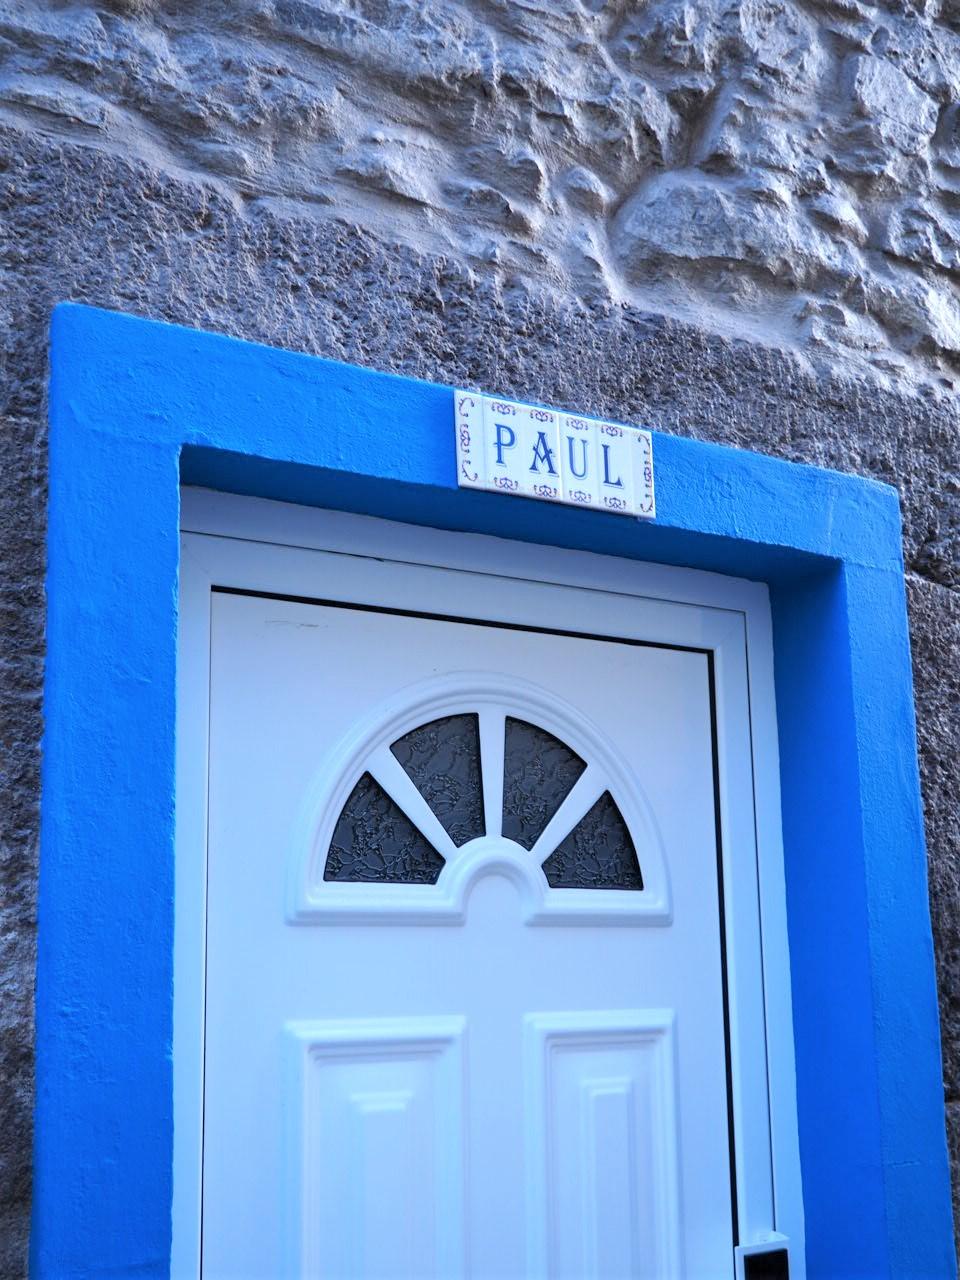 Paul-do-mar-village-madere-portugal-clioandco-vierge porte